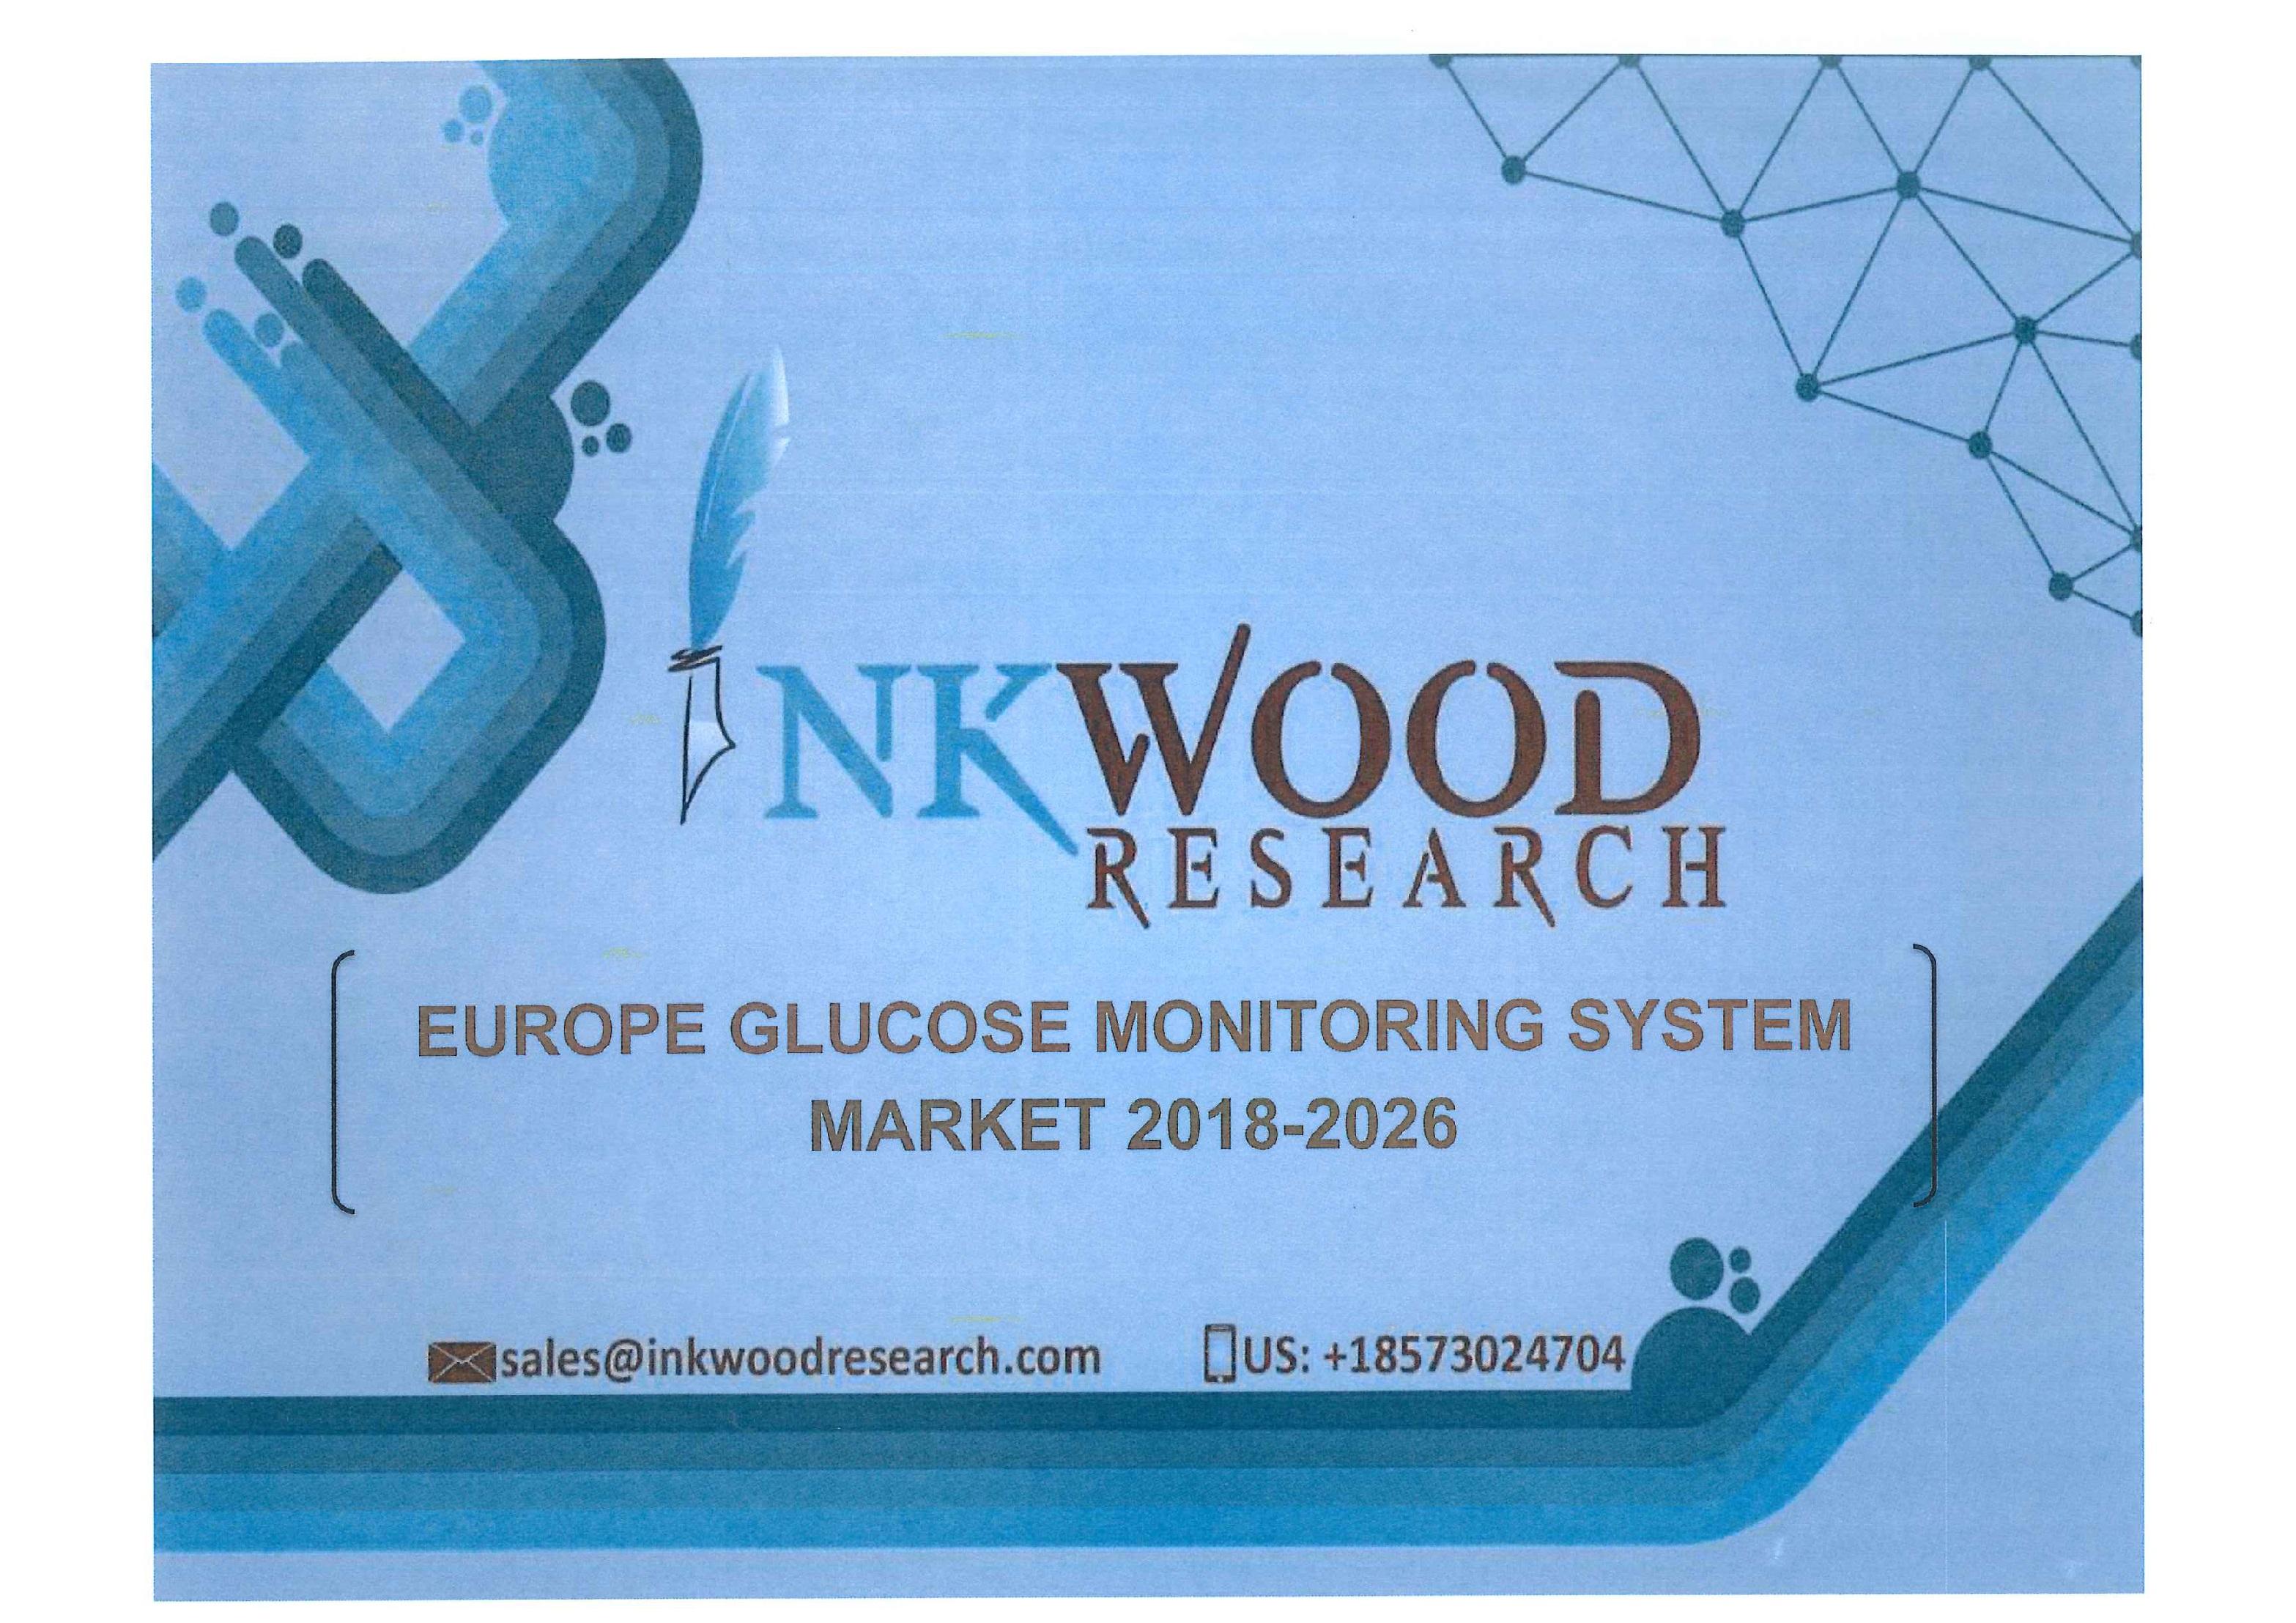 Europe glucose monitoring system market 2018-2026 [e-book]